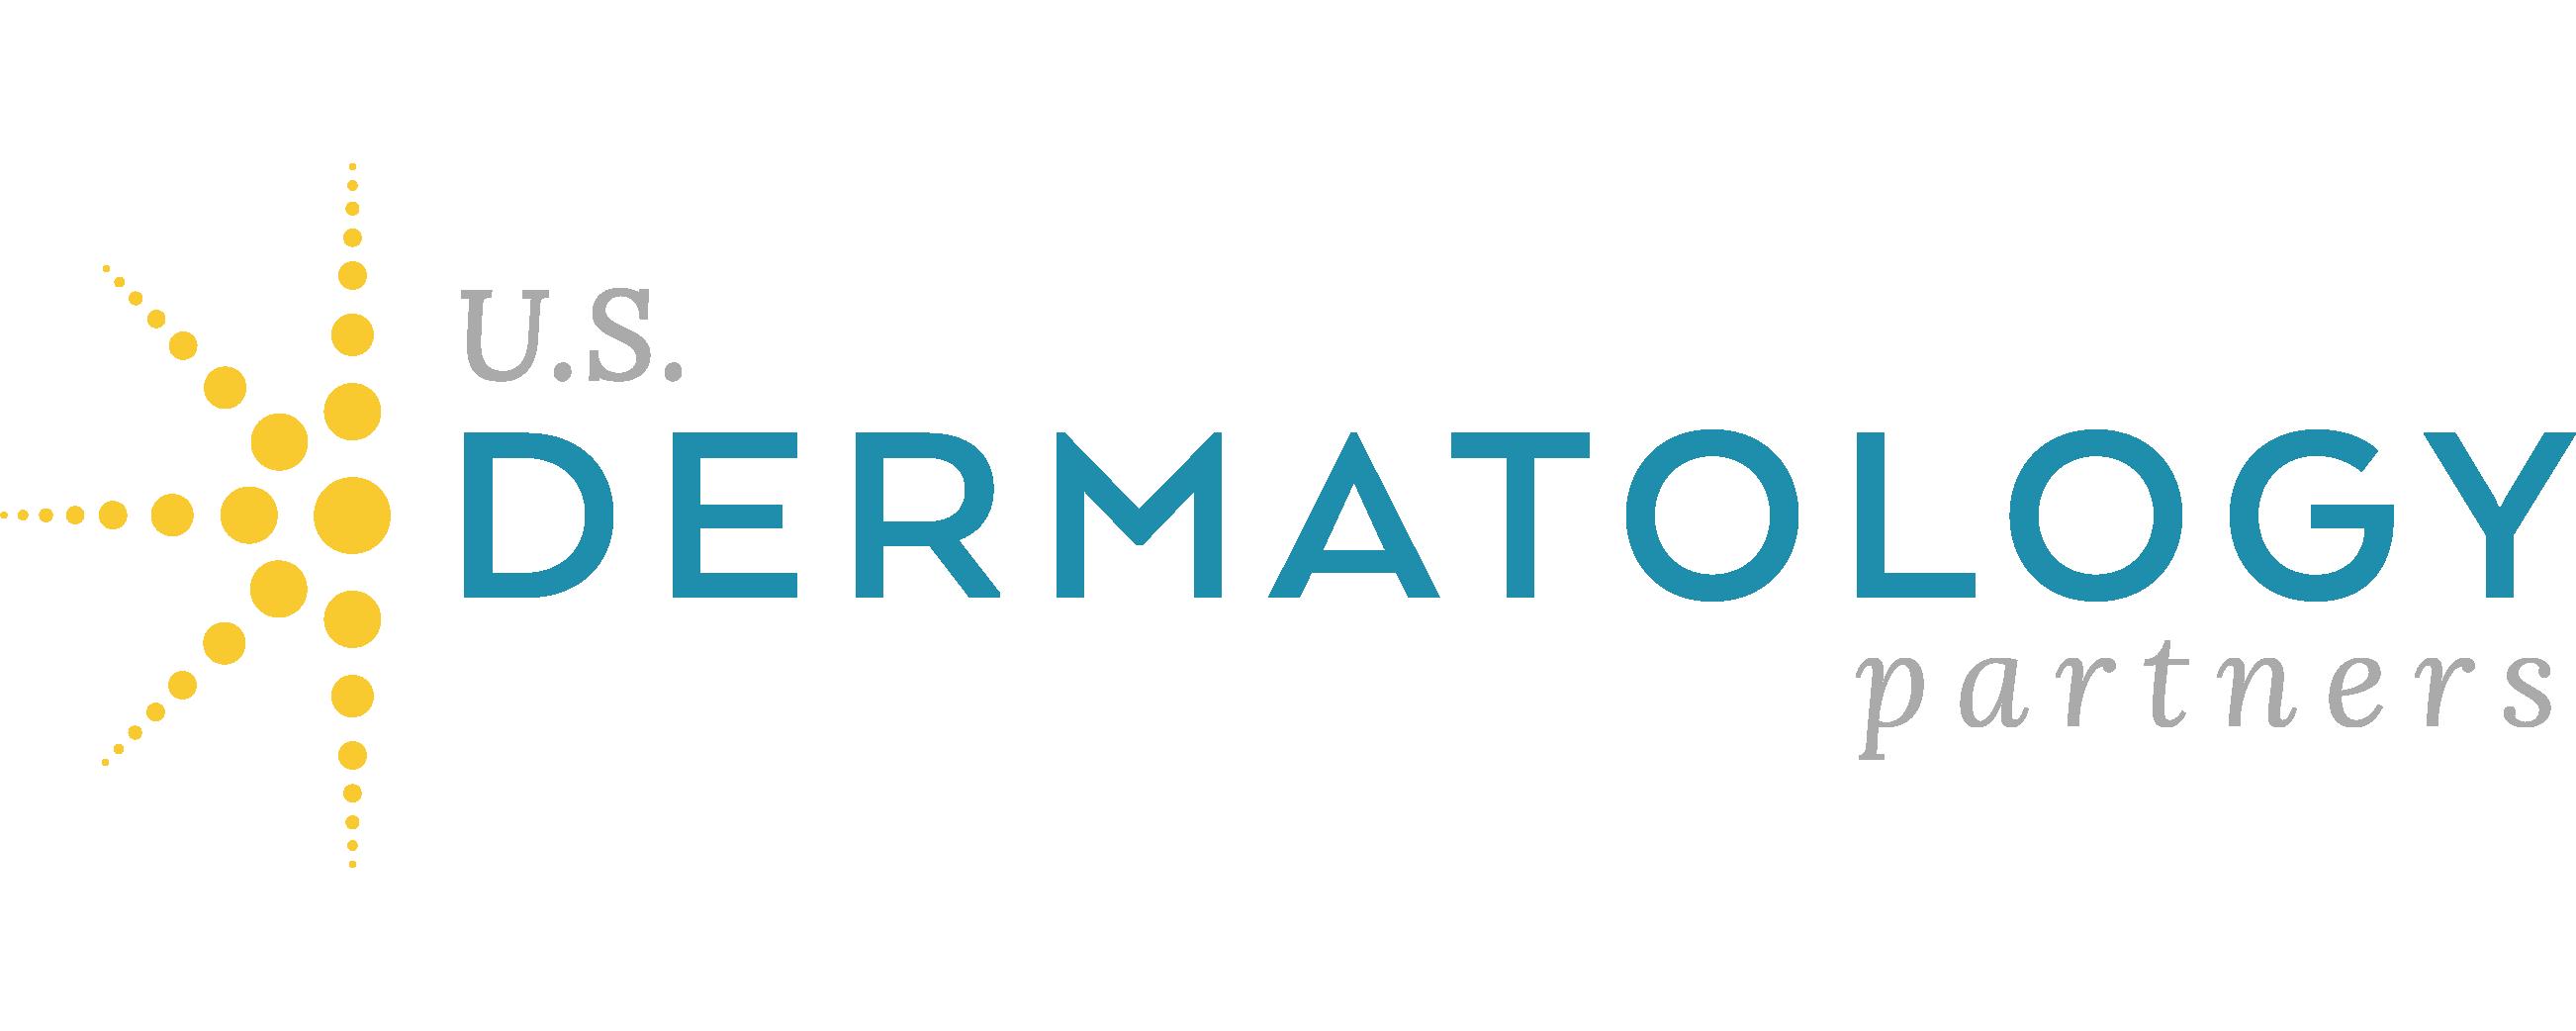 U.S. Dermatology Partners -  Dallas Presbyterian Logo